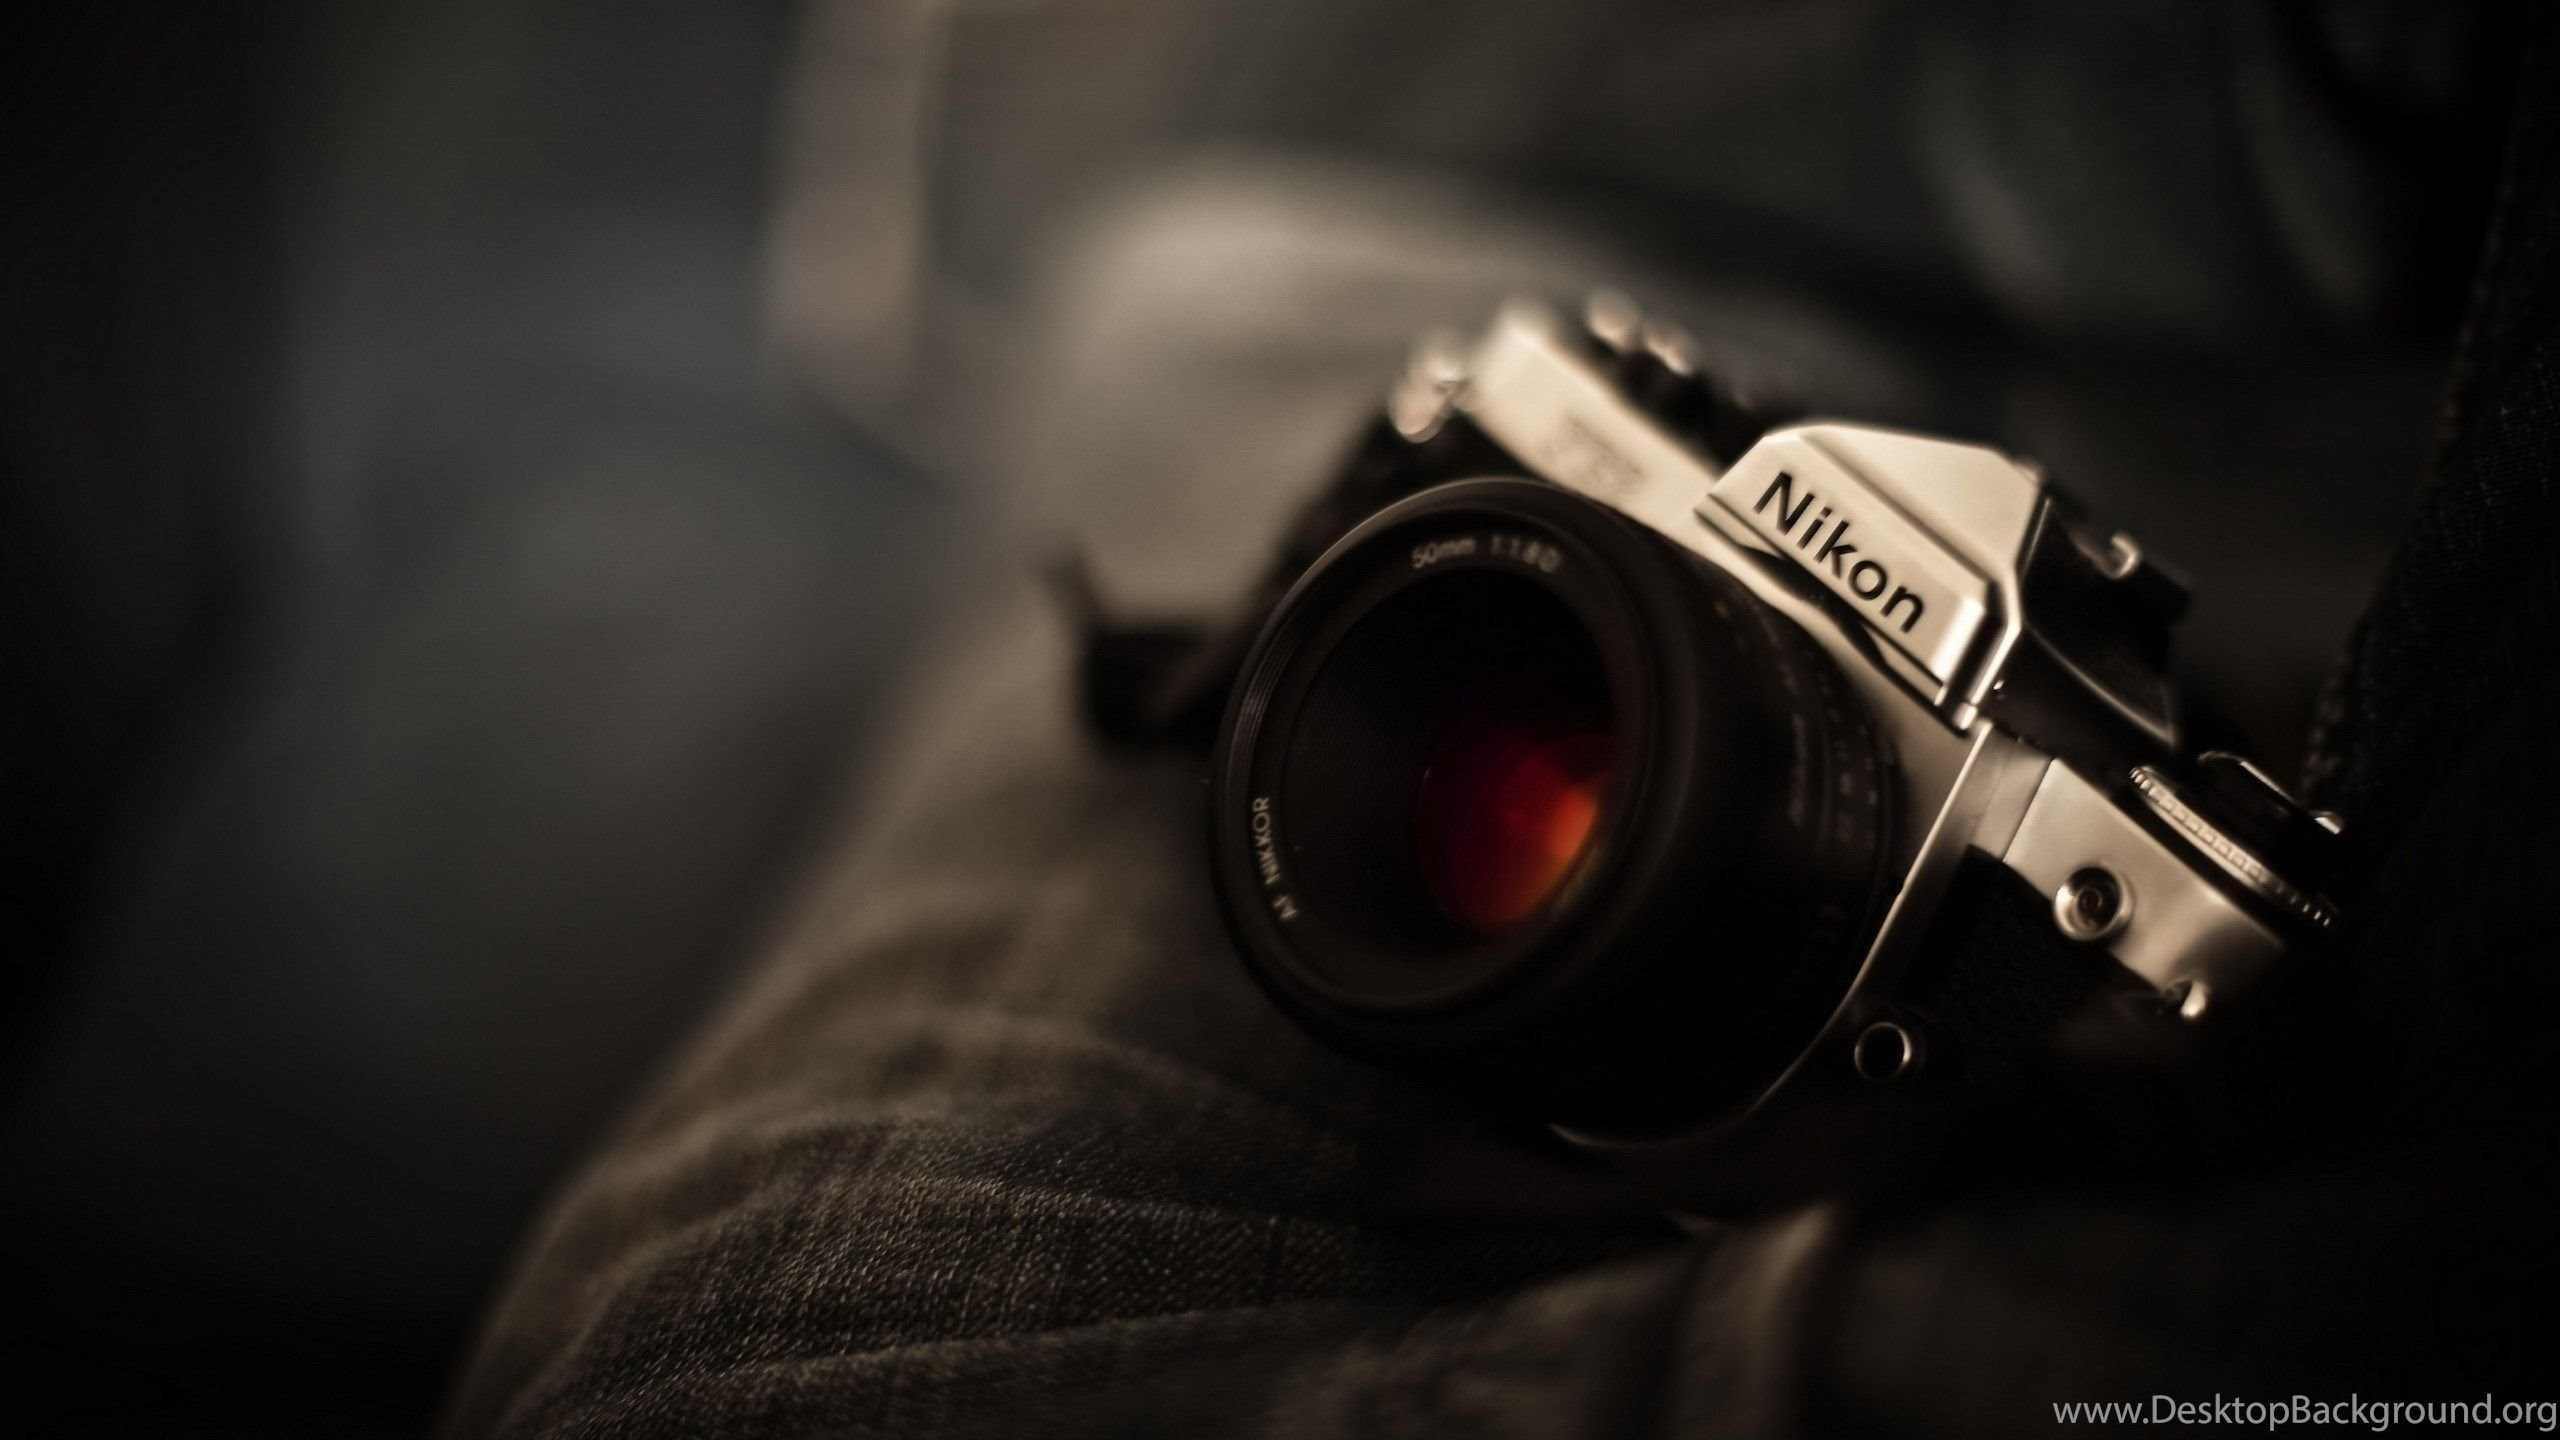 Camera Vintage Android : Nikon classic camera hi tech photo vintage photographer